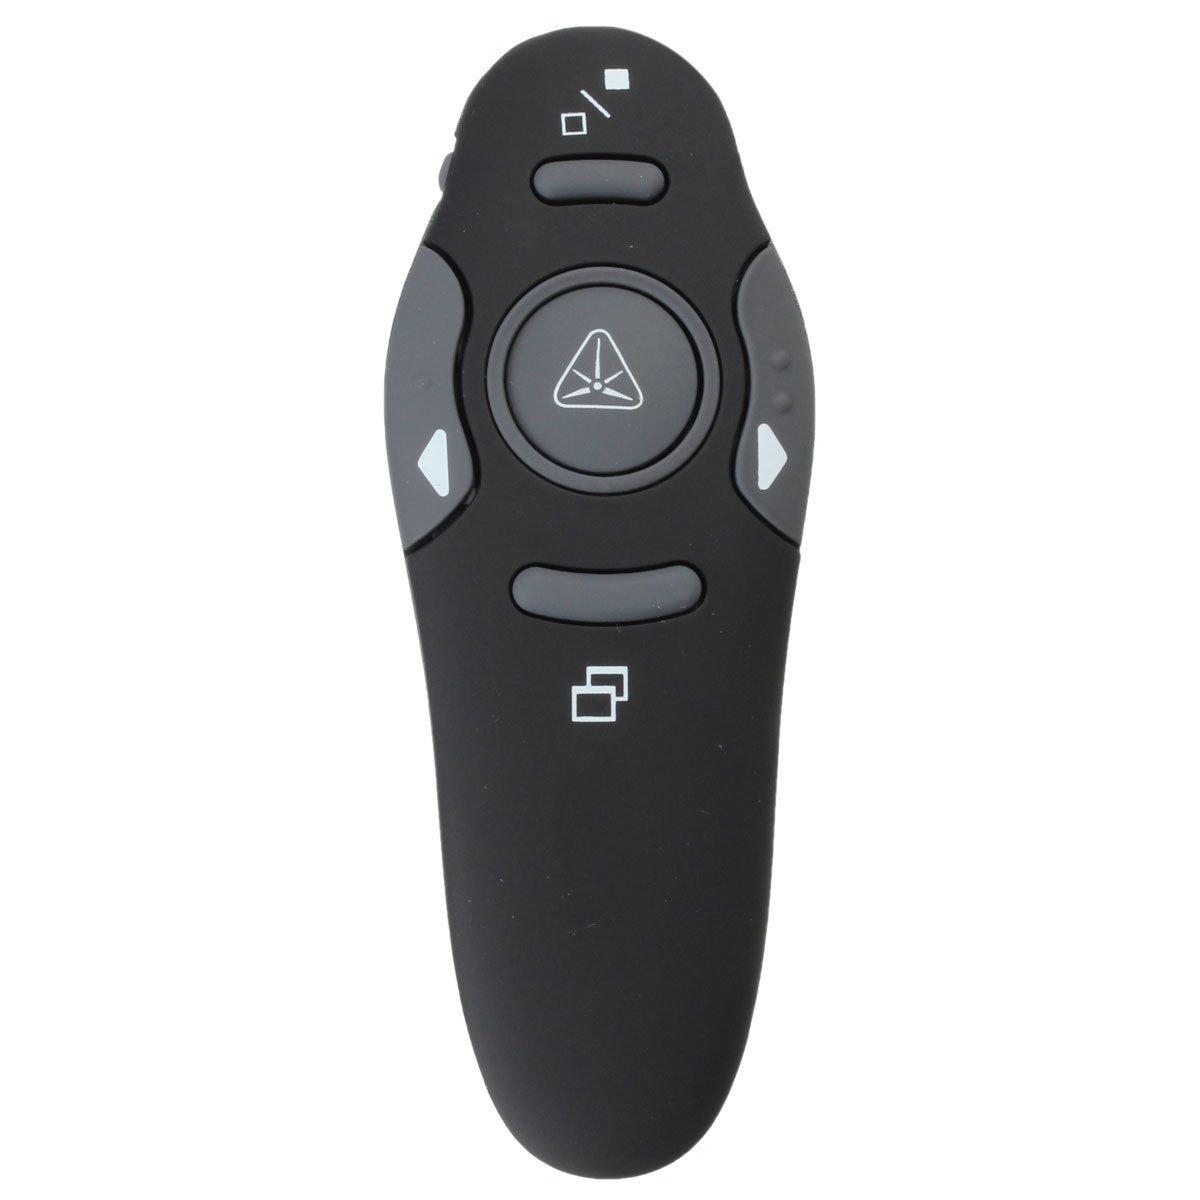 Wireless Presenter Remote Control - Presenter Remote Control -E52.4GHz Wireless Remote Control Presenter Presentation USB Laser Pointer Pen Receiver-( Wireless Presenter Pointer )